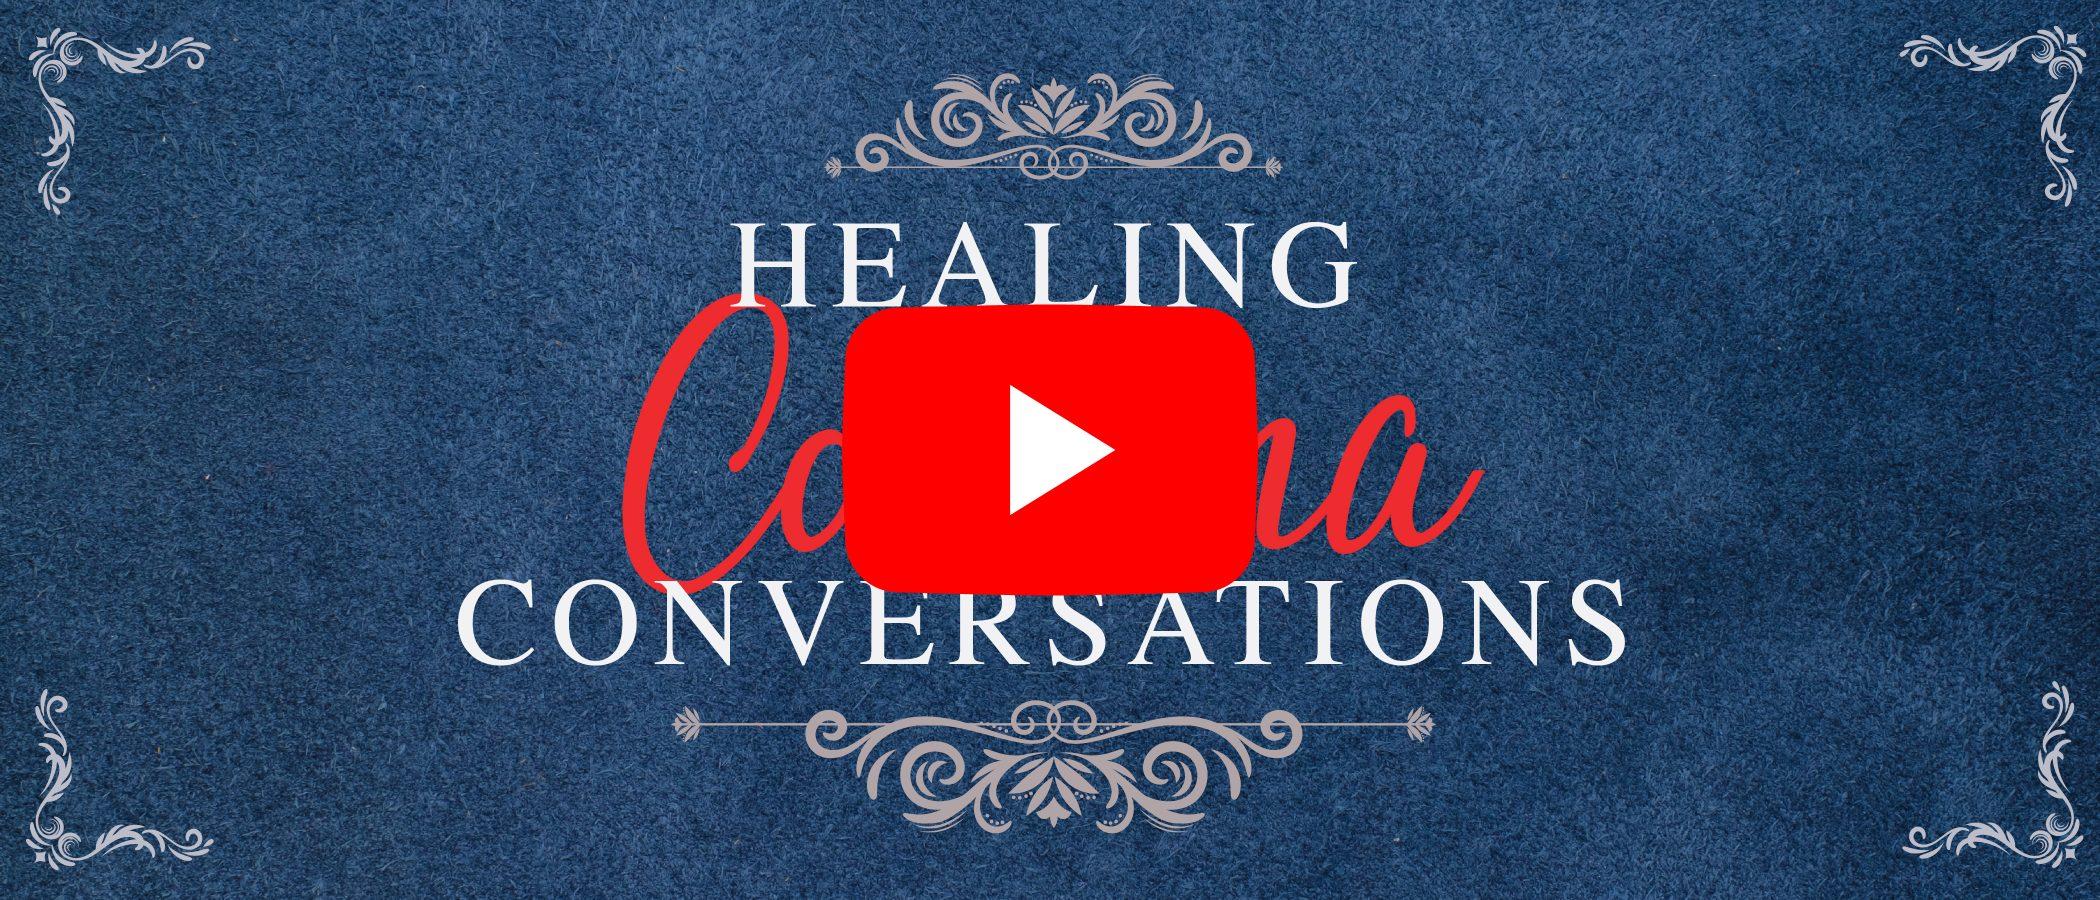 healing-corona-conversations-11brd-dq2021-web-banner-video2x-100